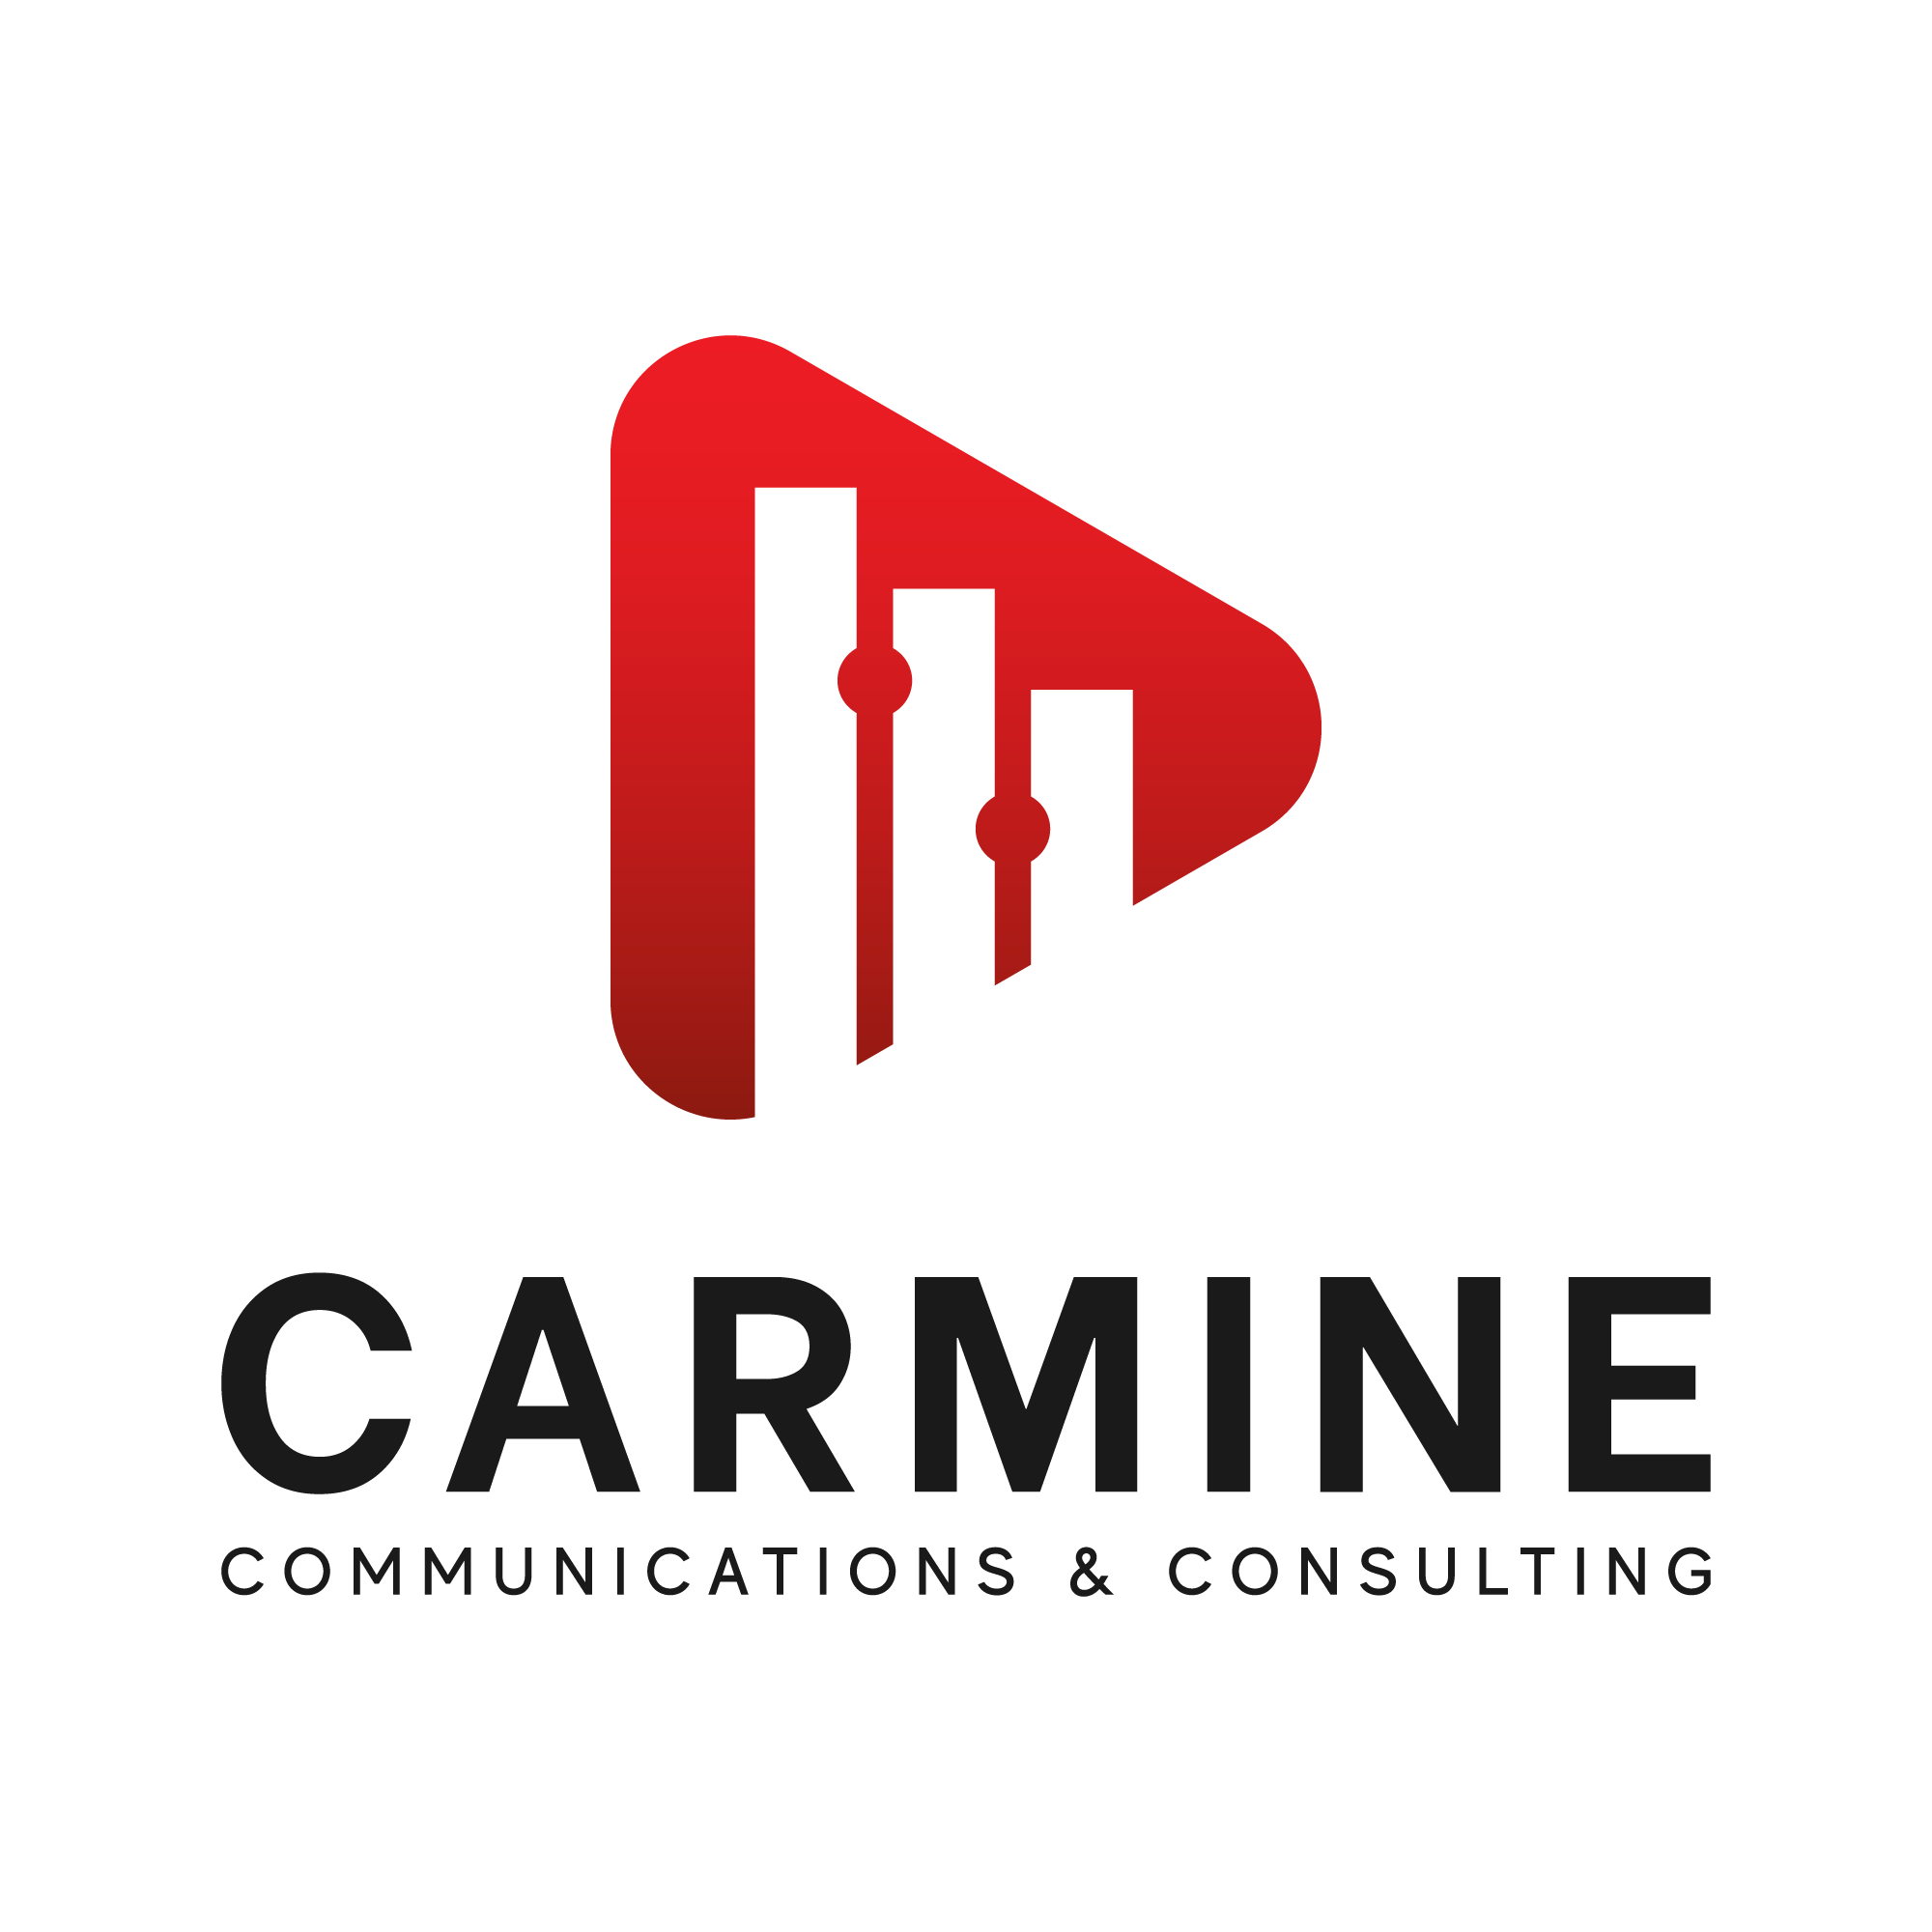 Carmine Communication